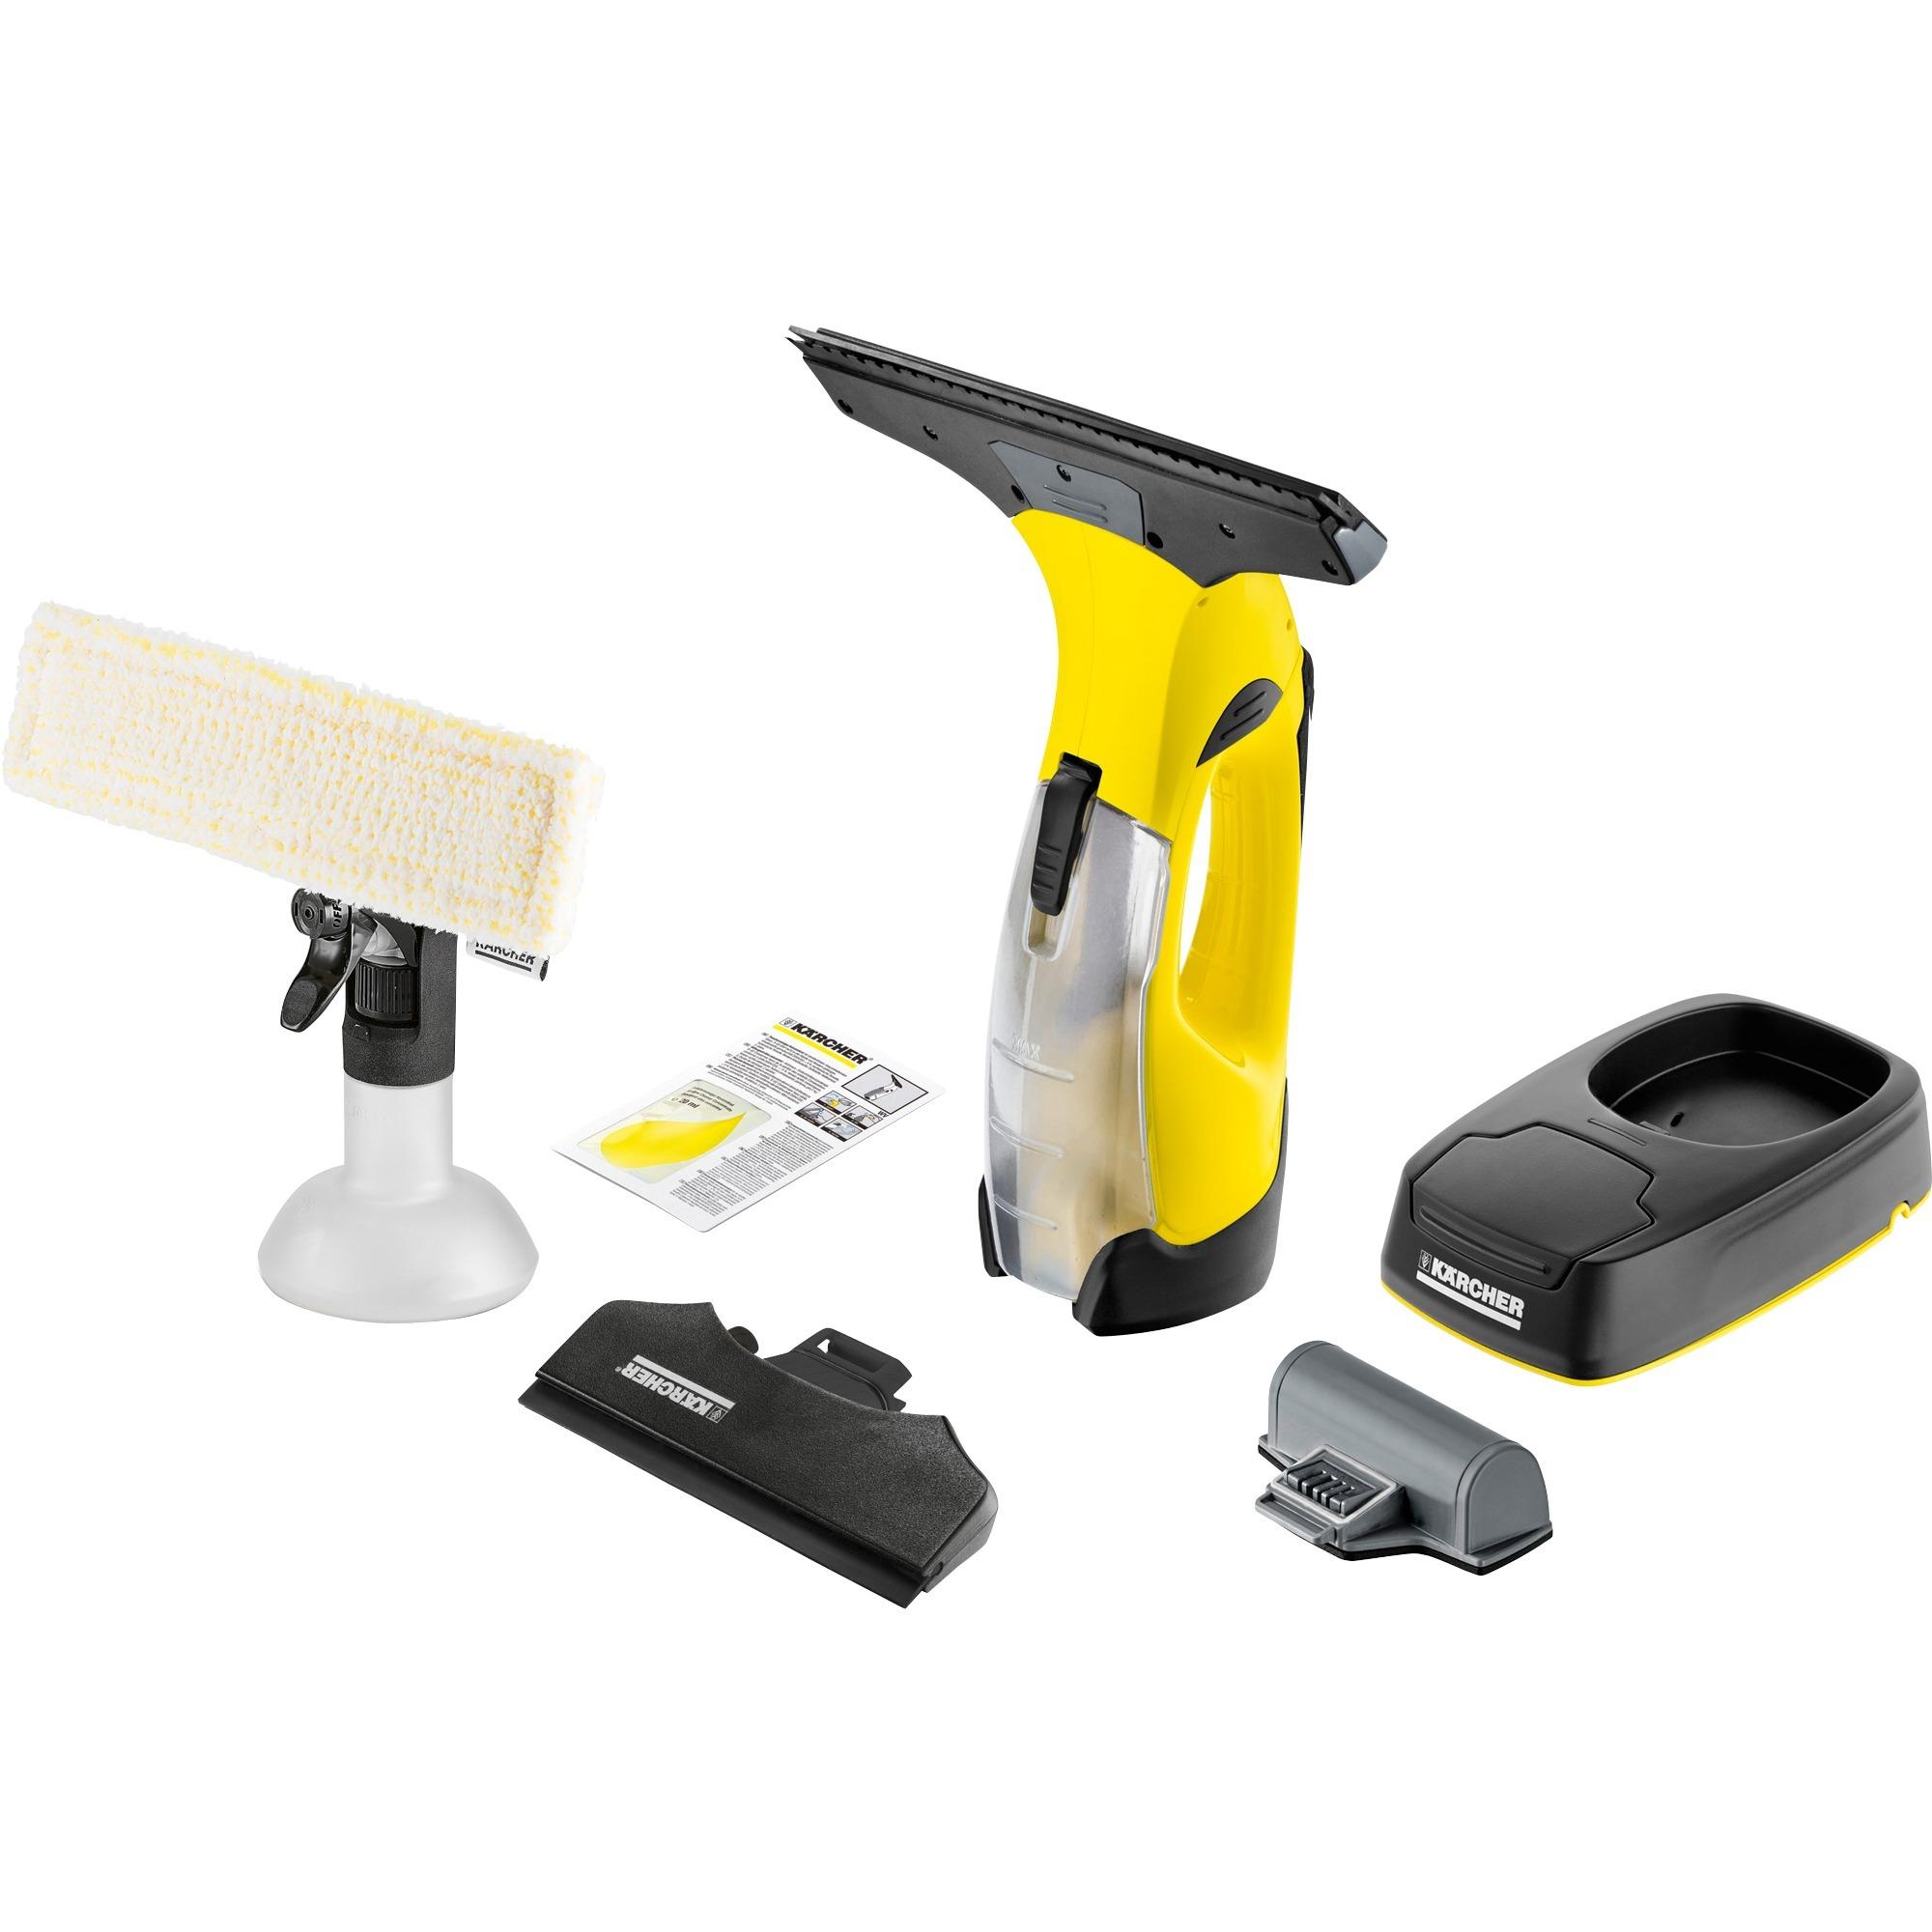 WV 5 Premium Non-Stop Cleaning Kit, Aspiradora de ventanas